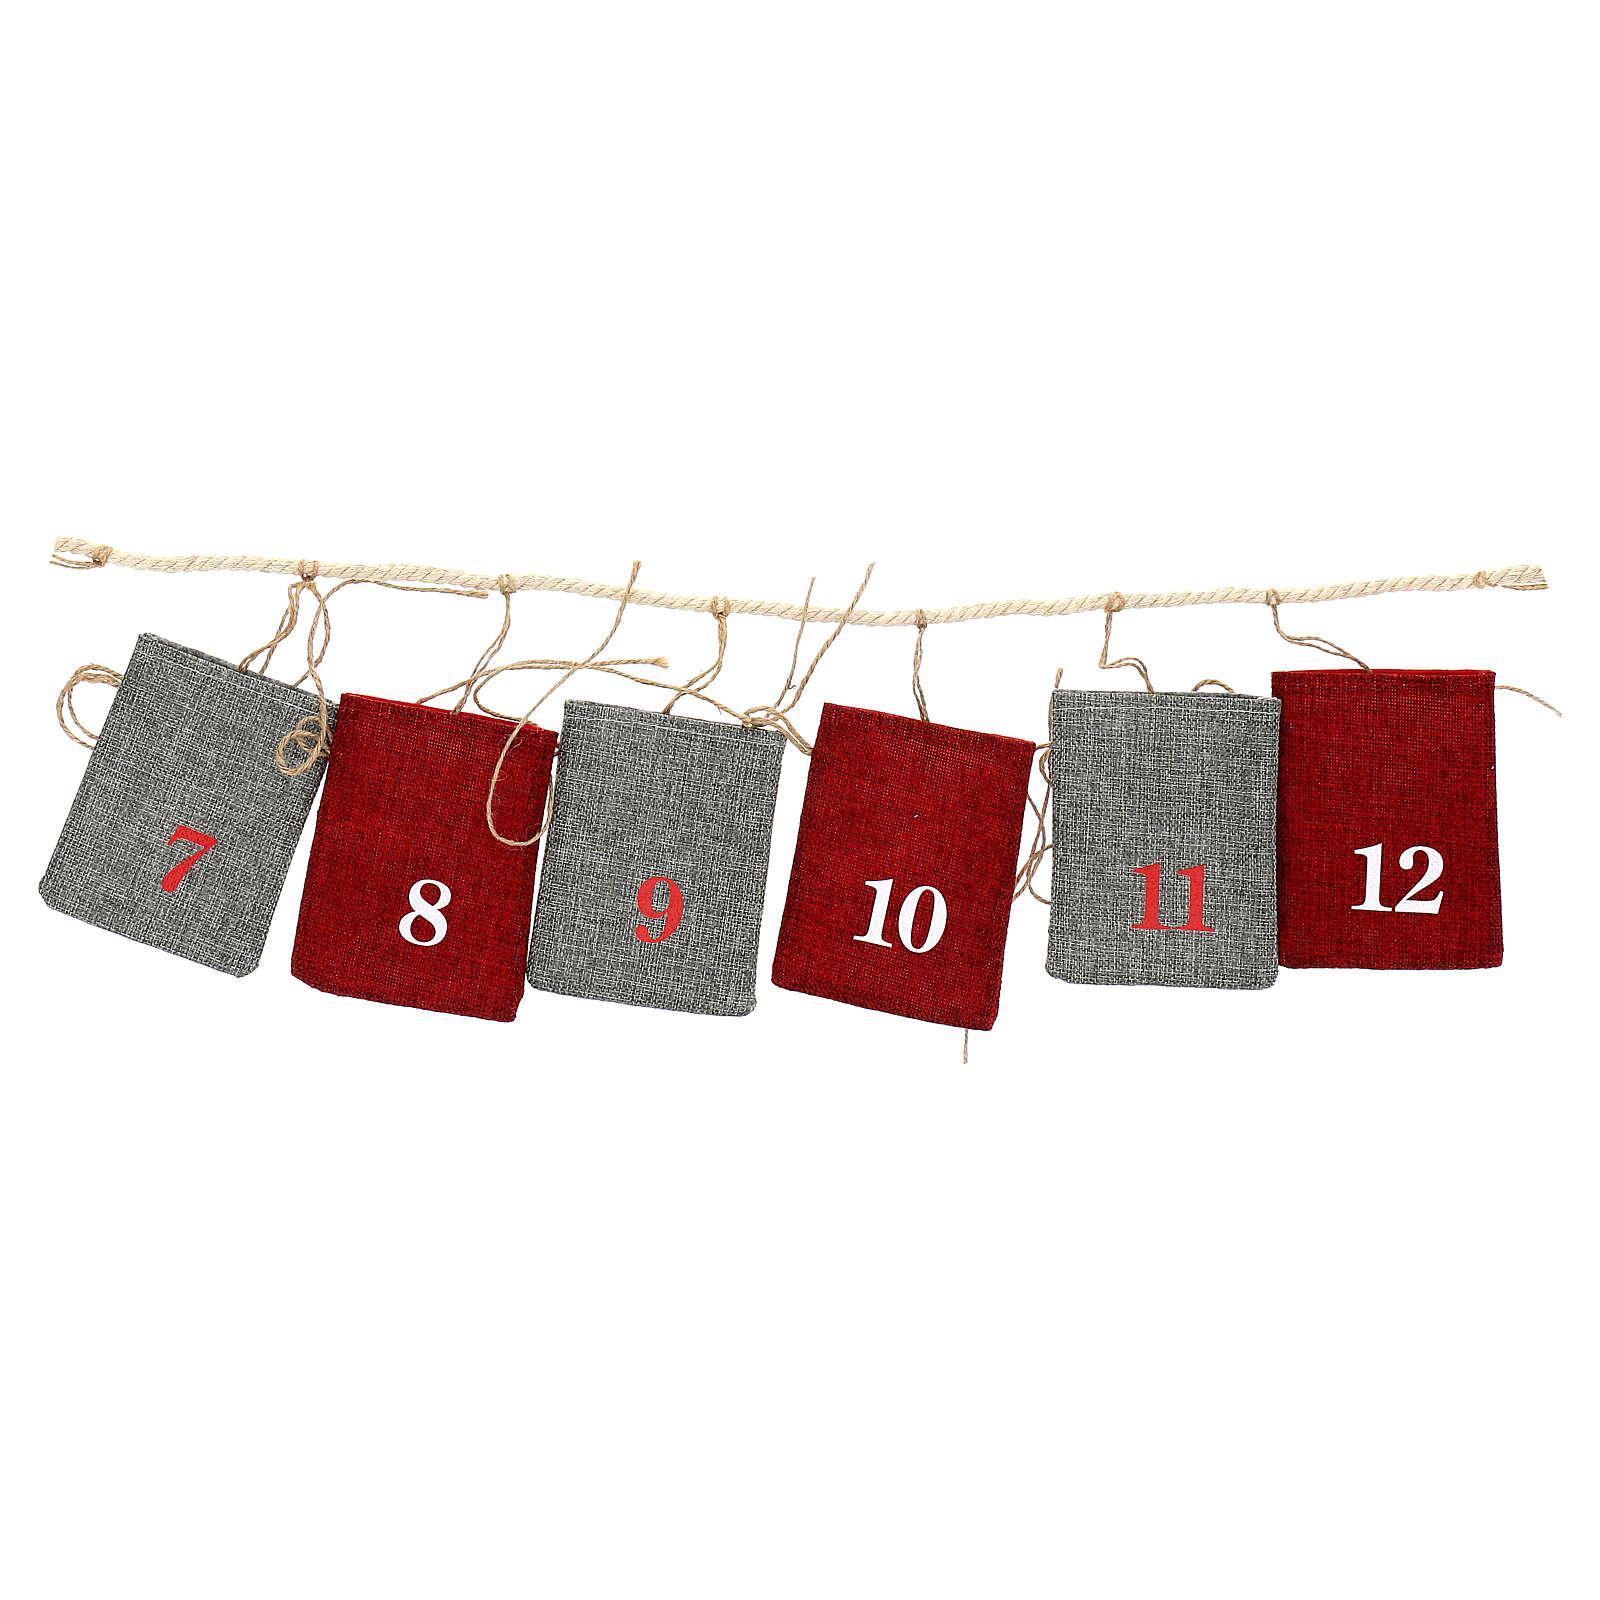 Fabric Advent Calendar with pockets 10x12 cm 3